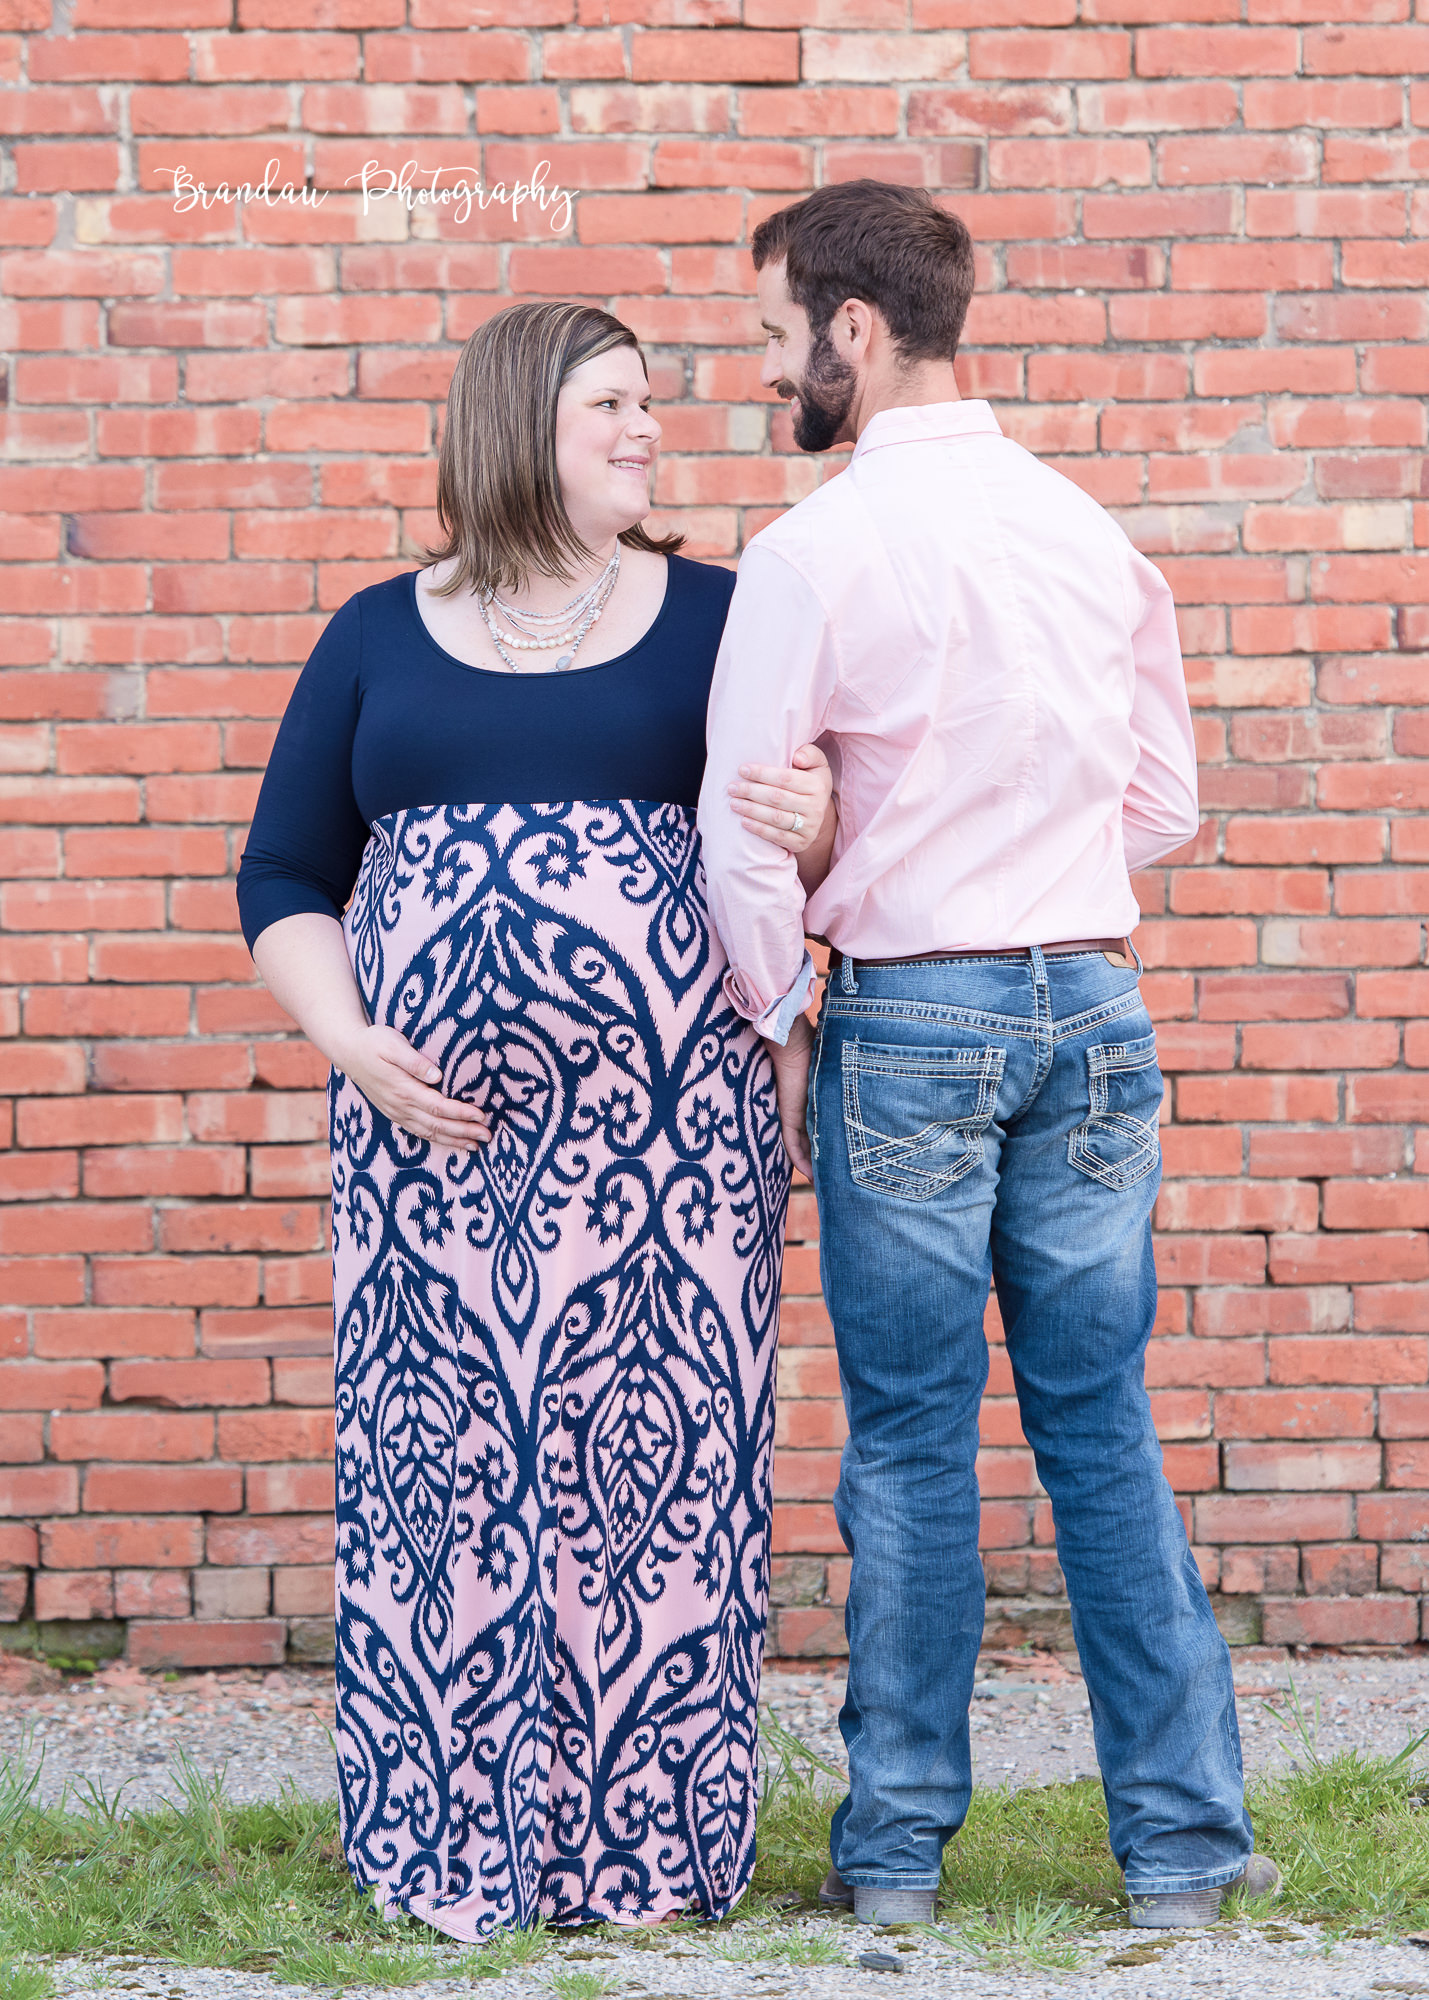 Engagement Loving Gaze_Brandau Photography-32.jpg